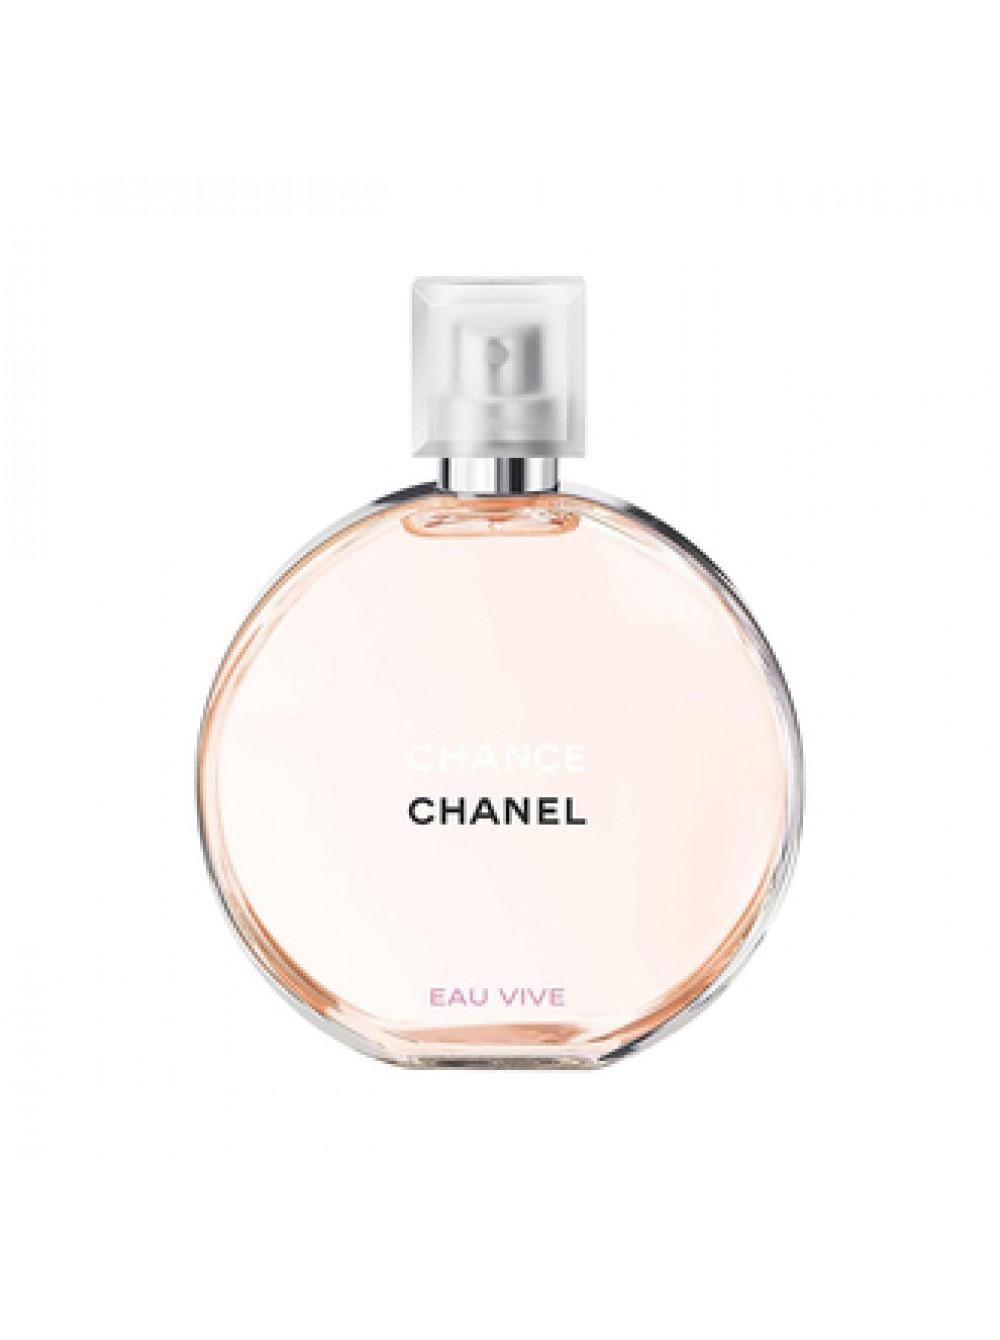 купить Chanel Chance Eau Vive тестер туалетная вода 50 мл в